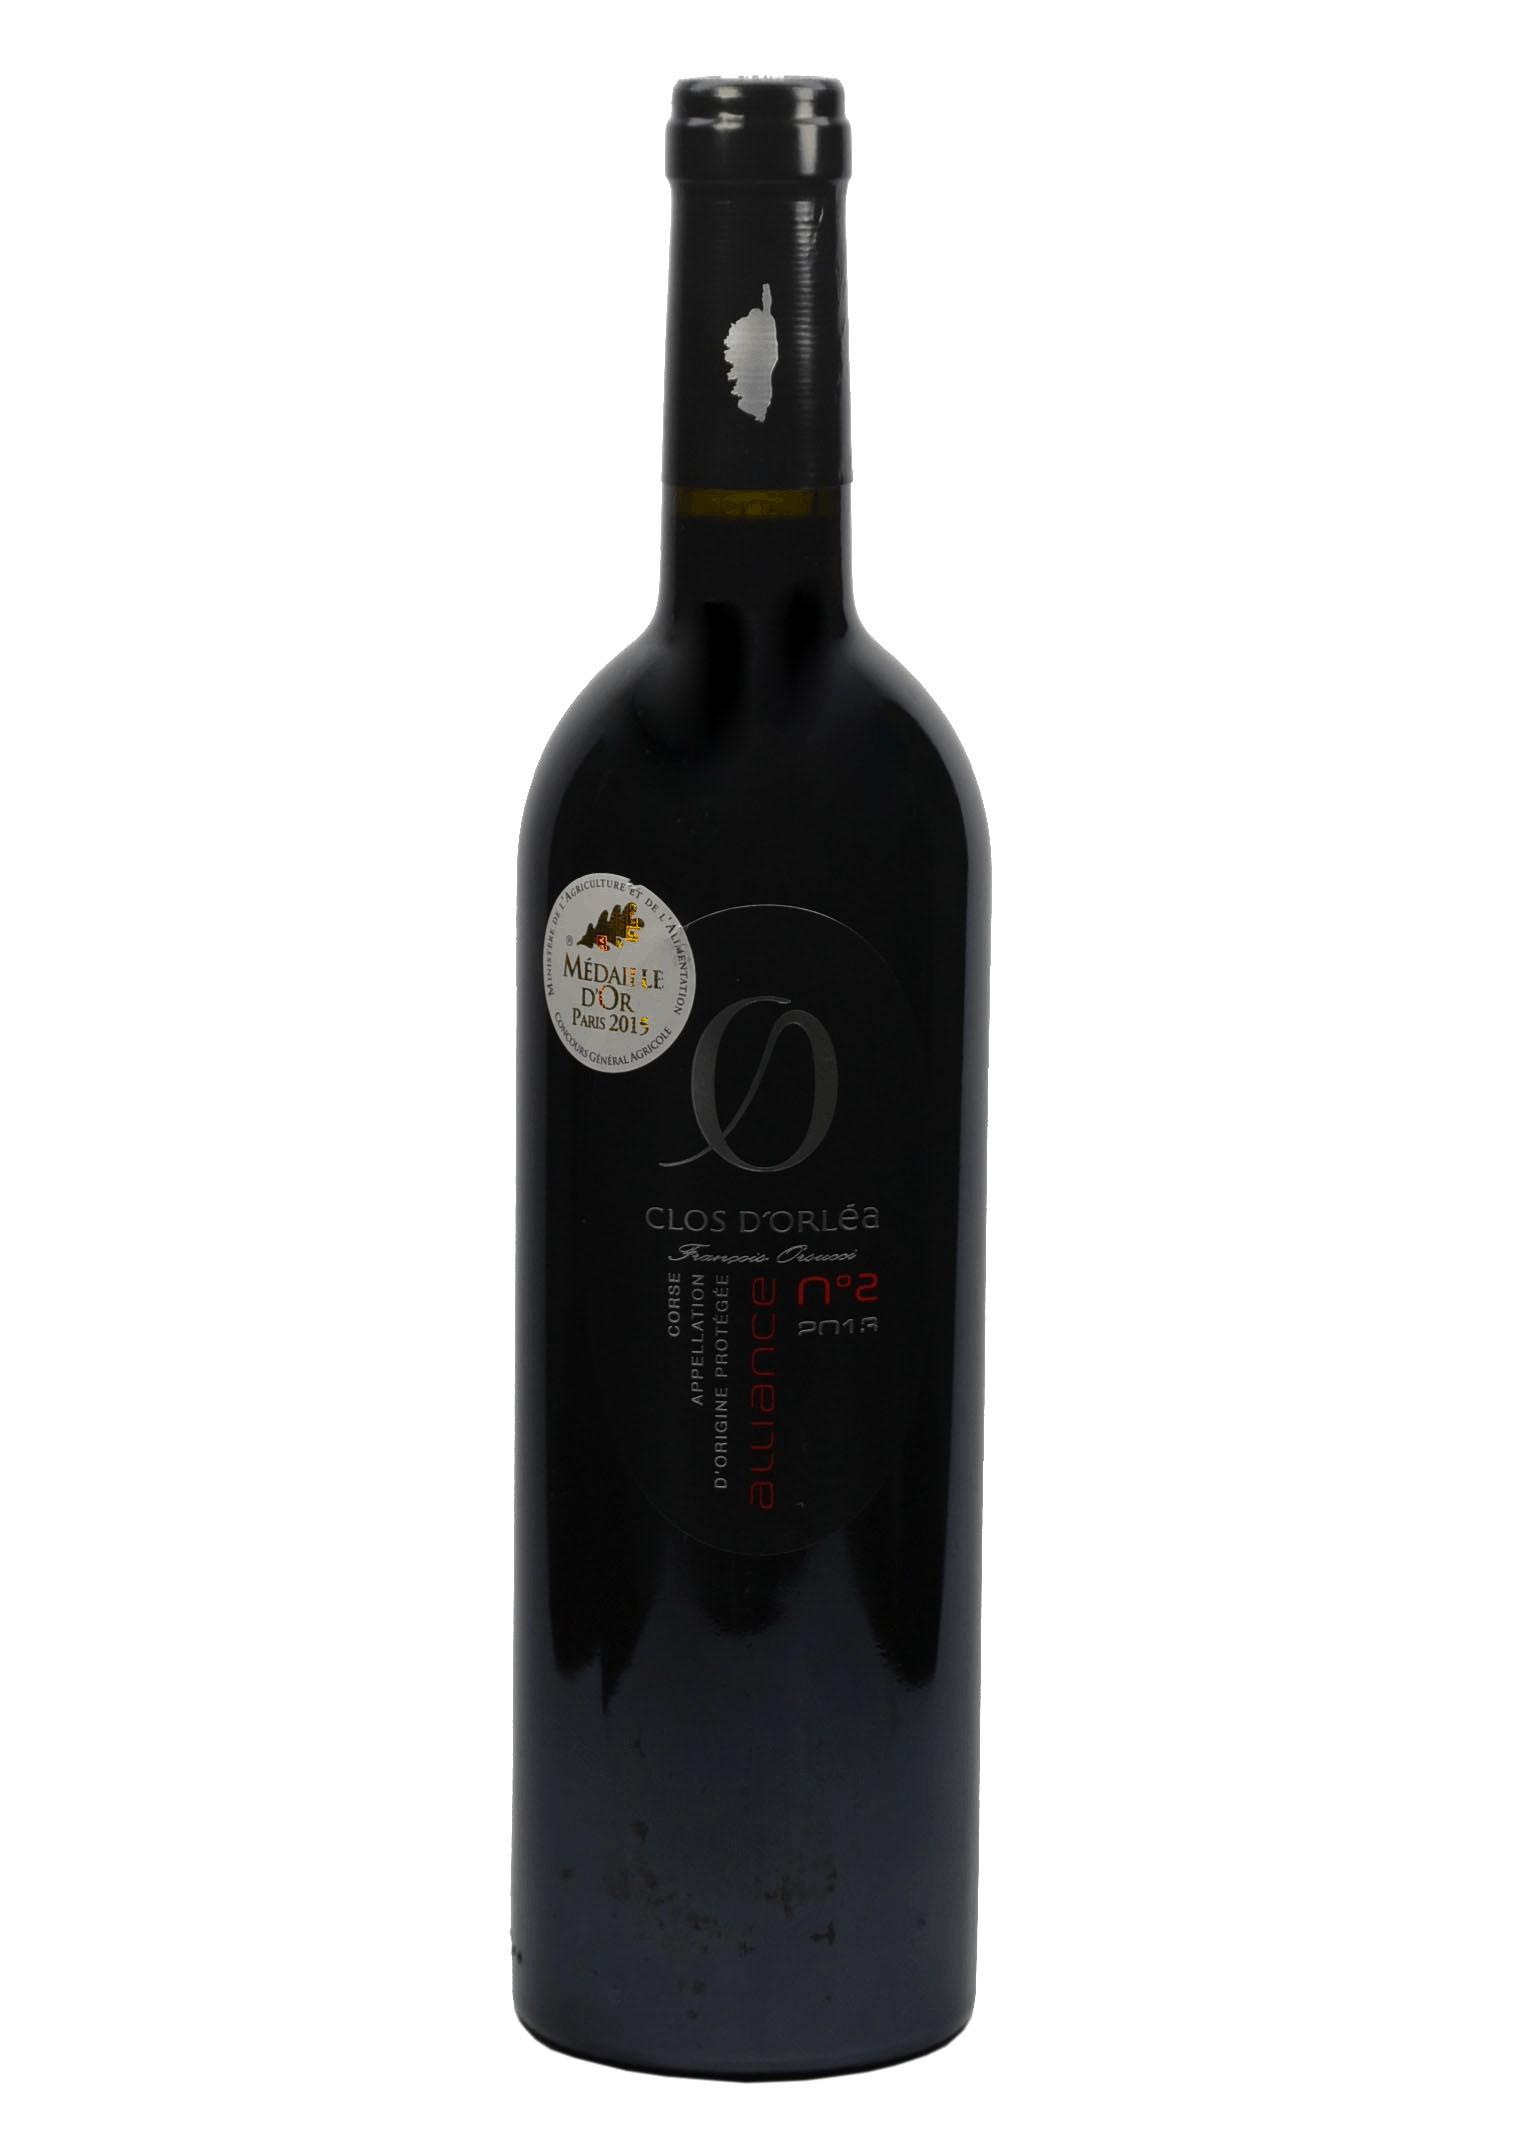 Les vins du Clos d'Orléa